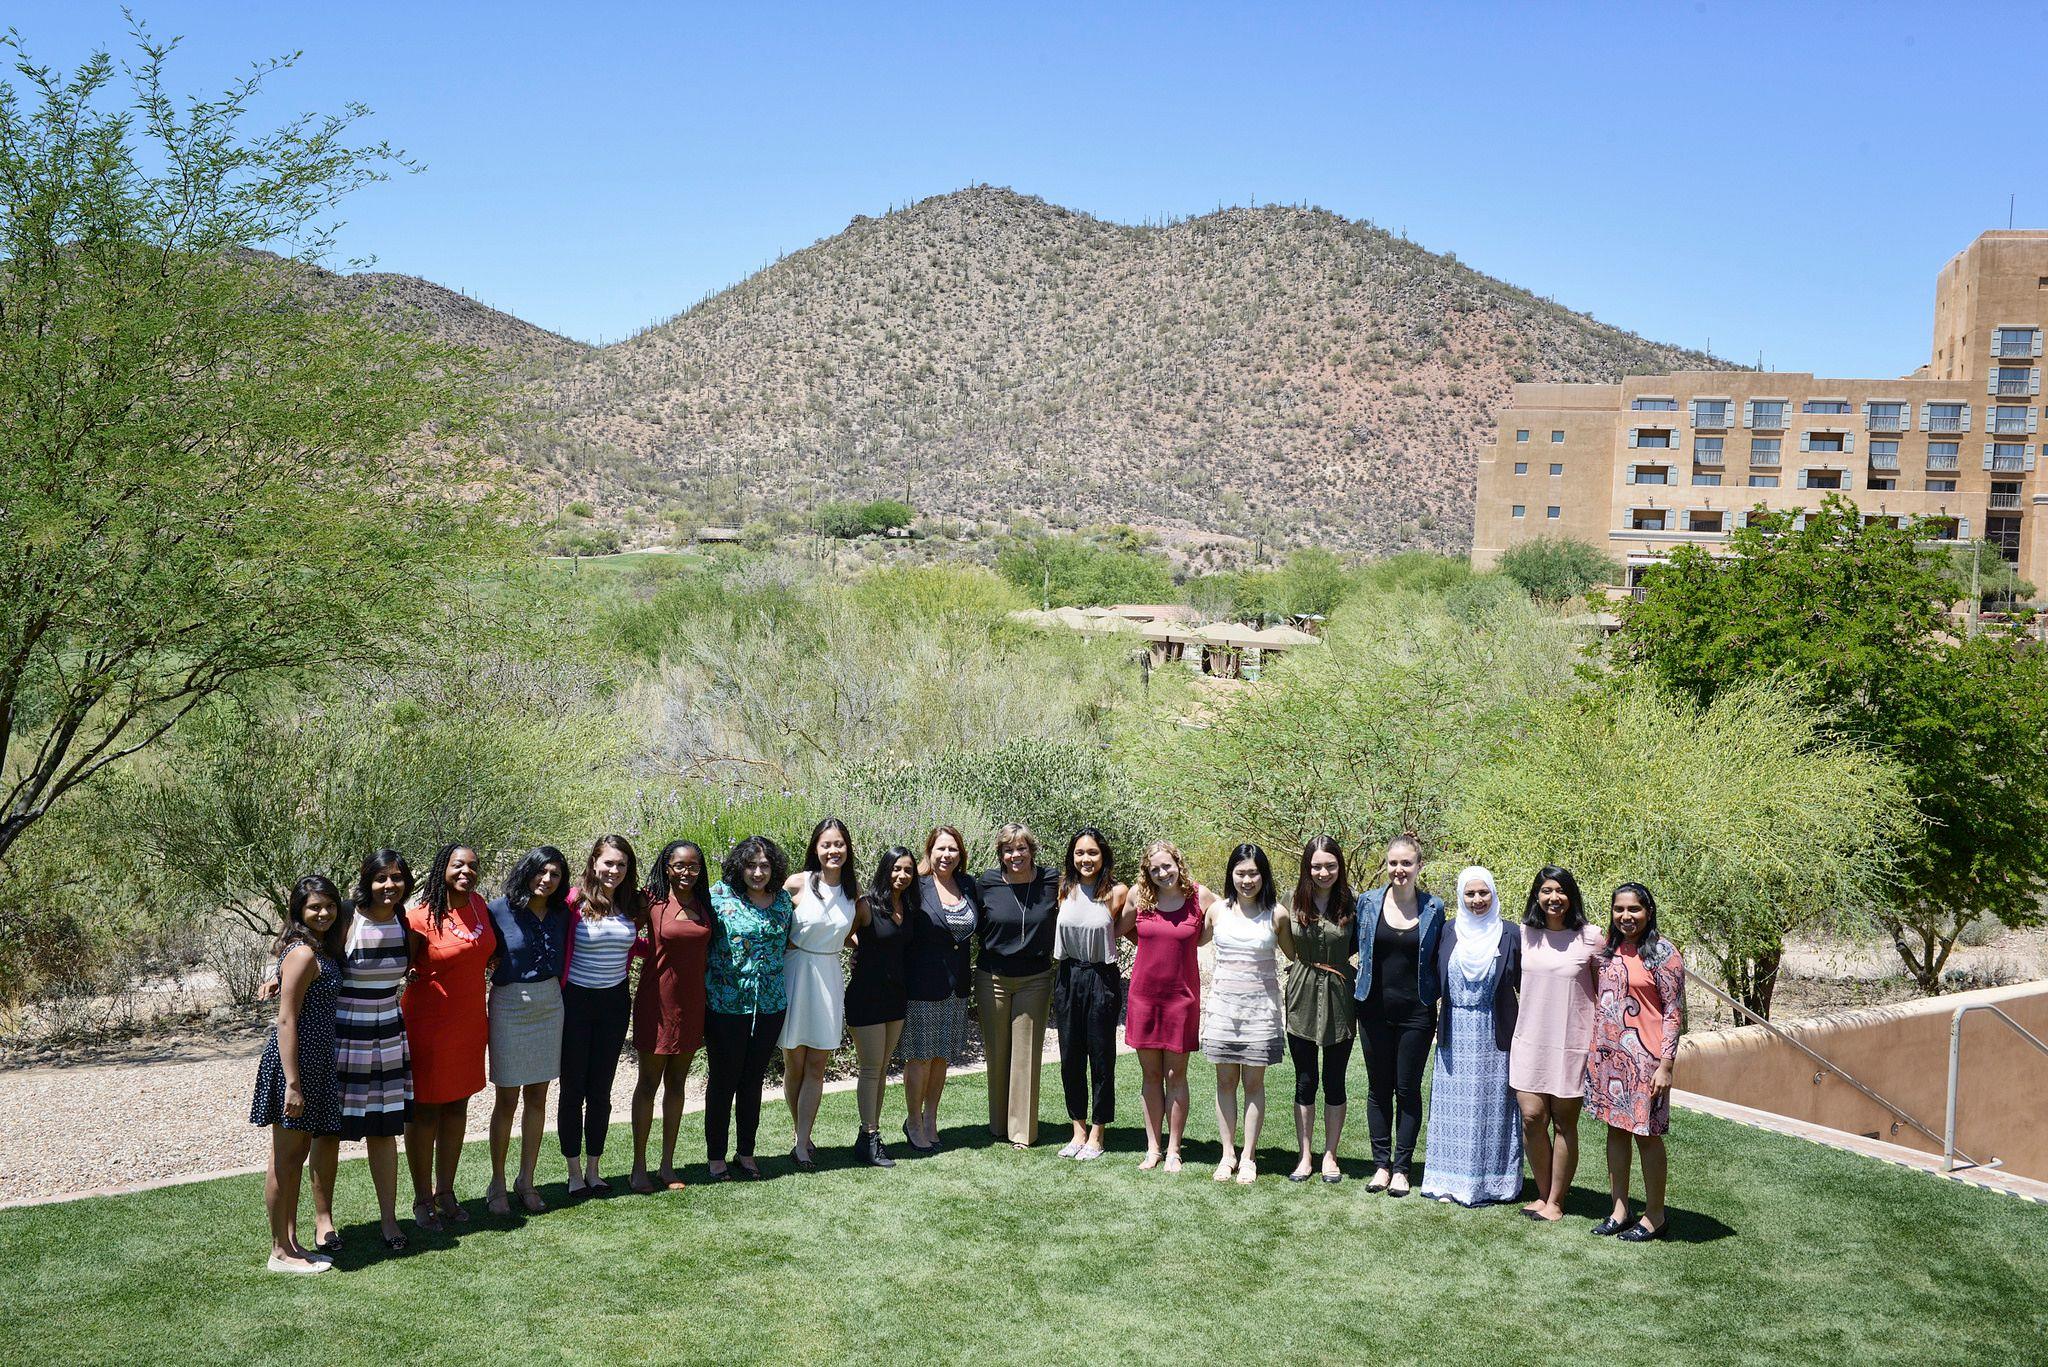 NCWIT Tucson - 2017